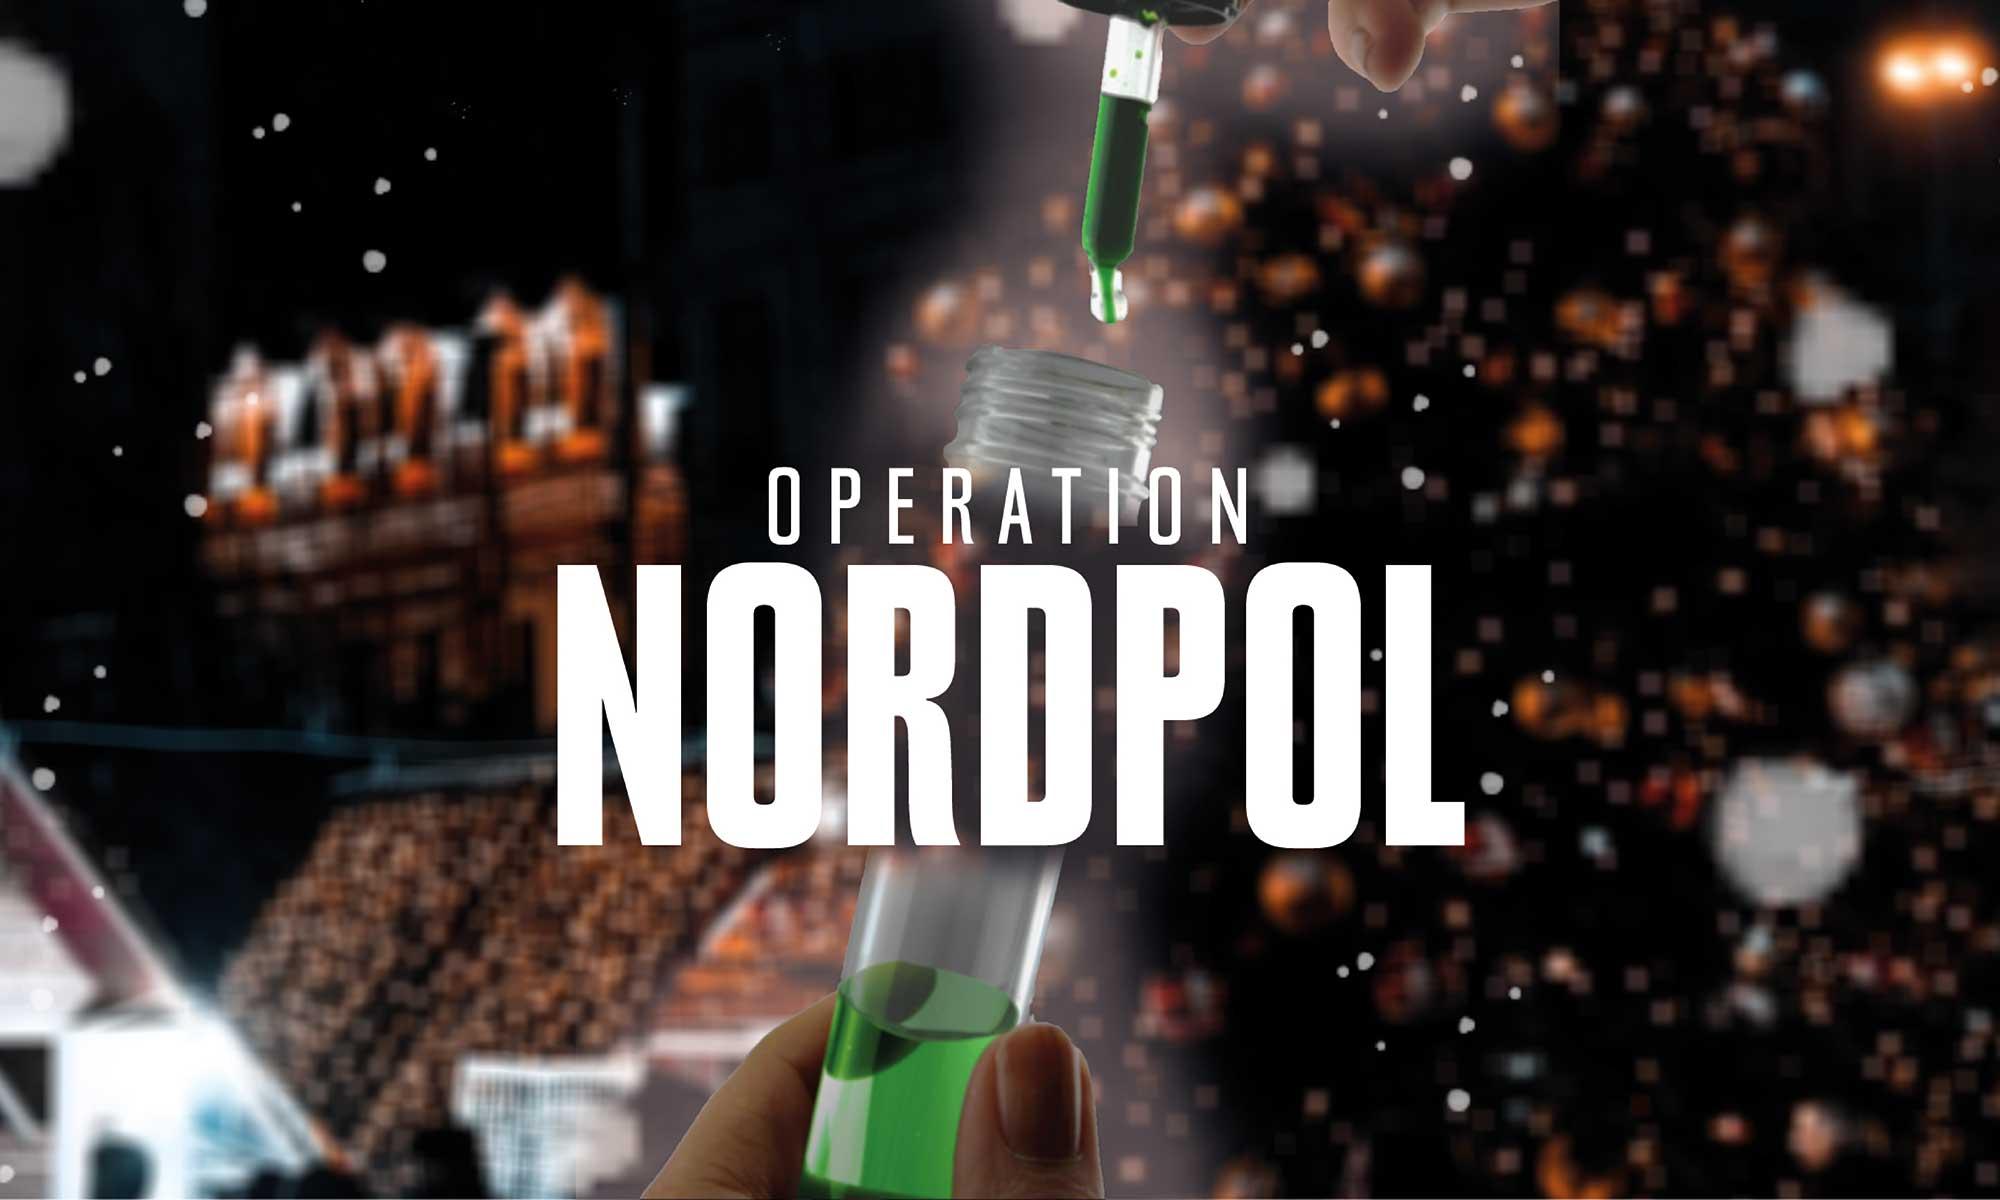 OperationNordpol